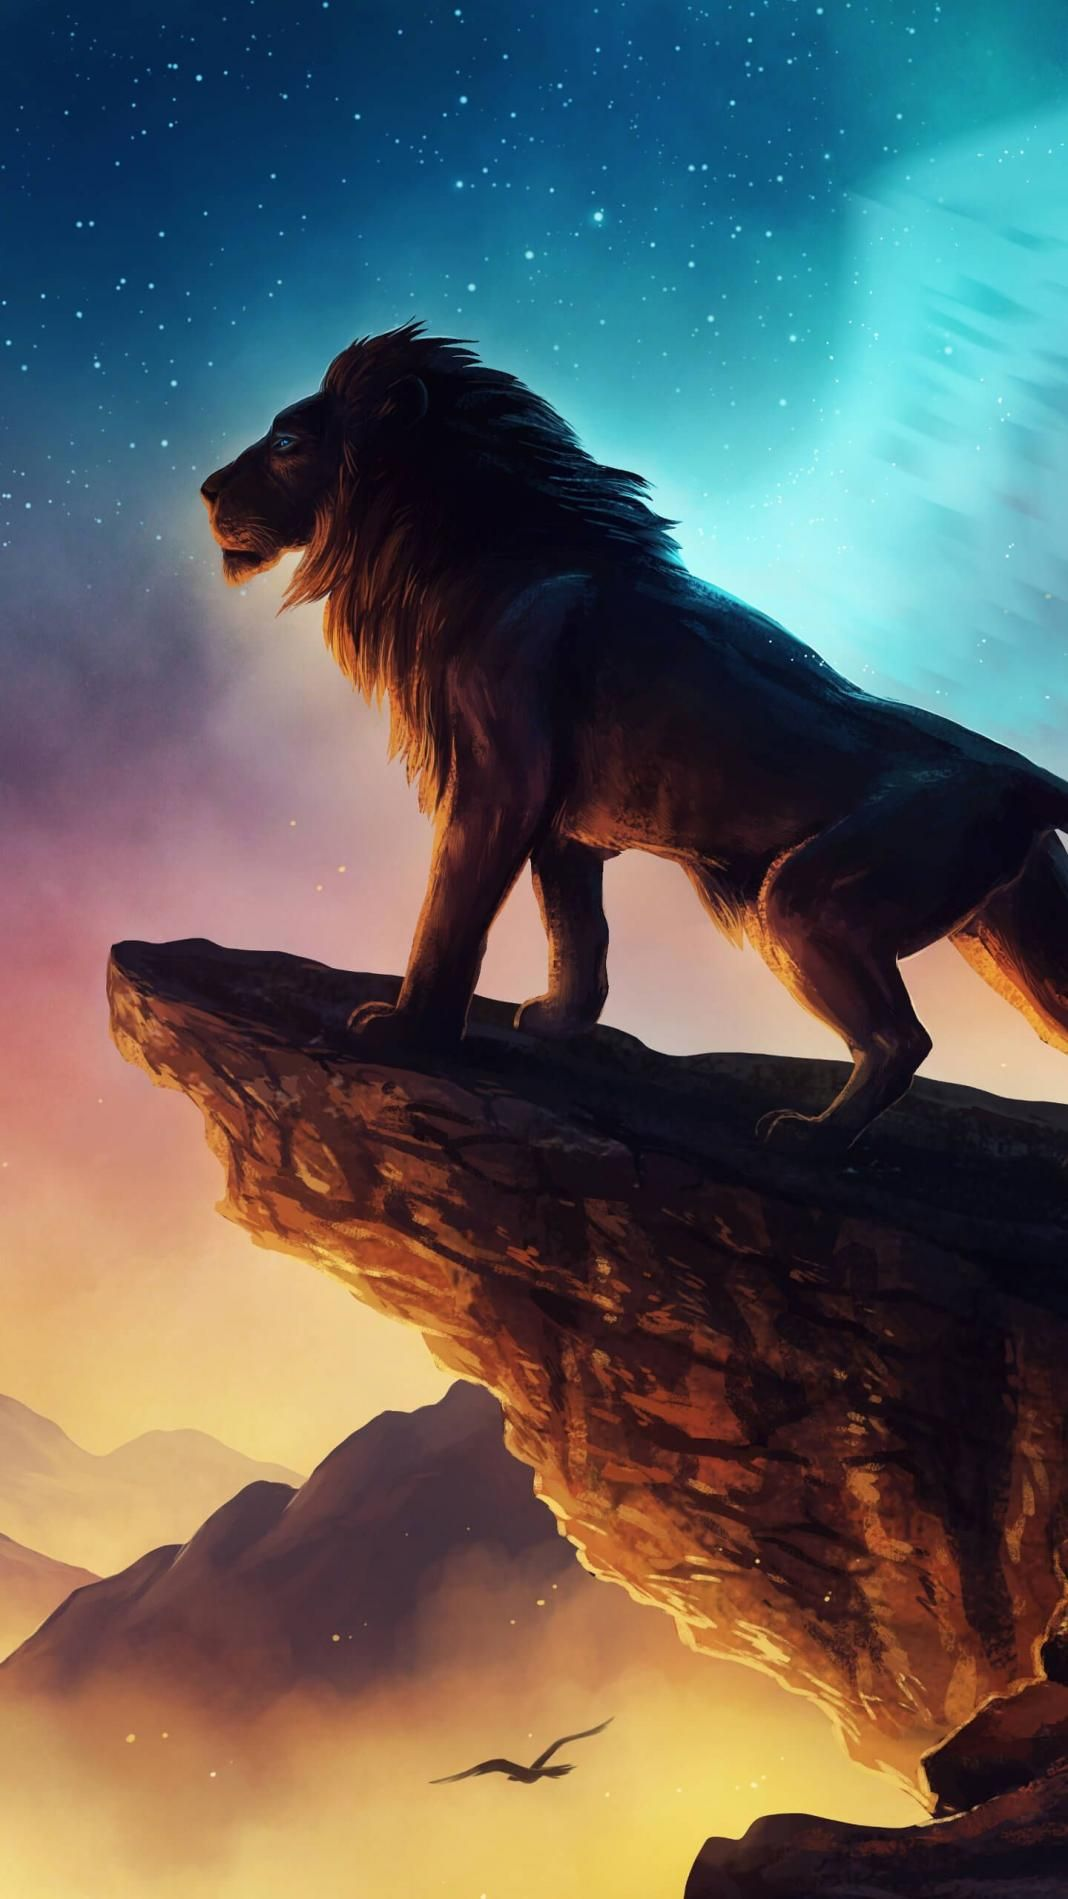 O Rei Leão papel de parede The Lion King 2019 Wallpapers